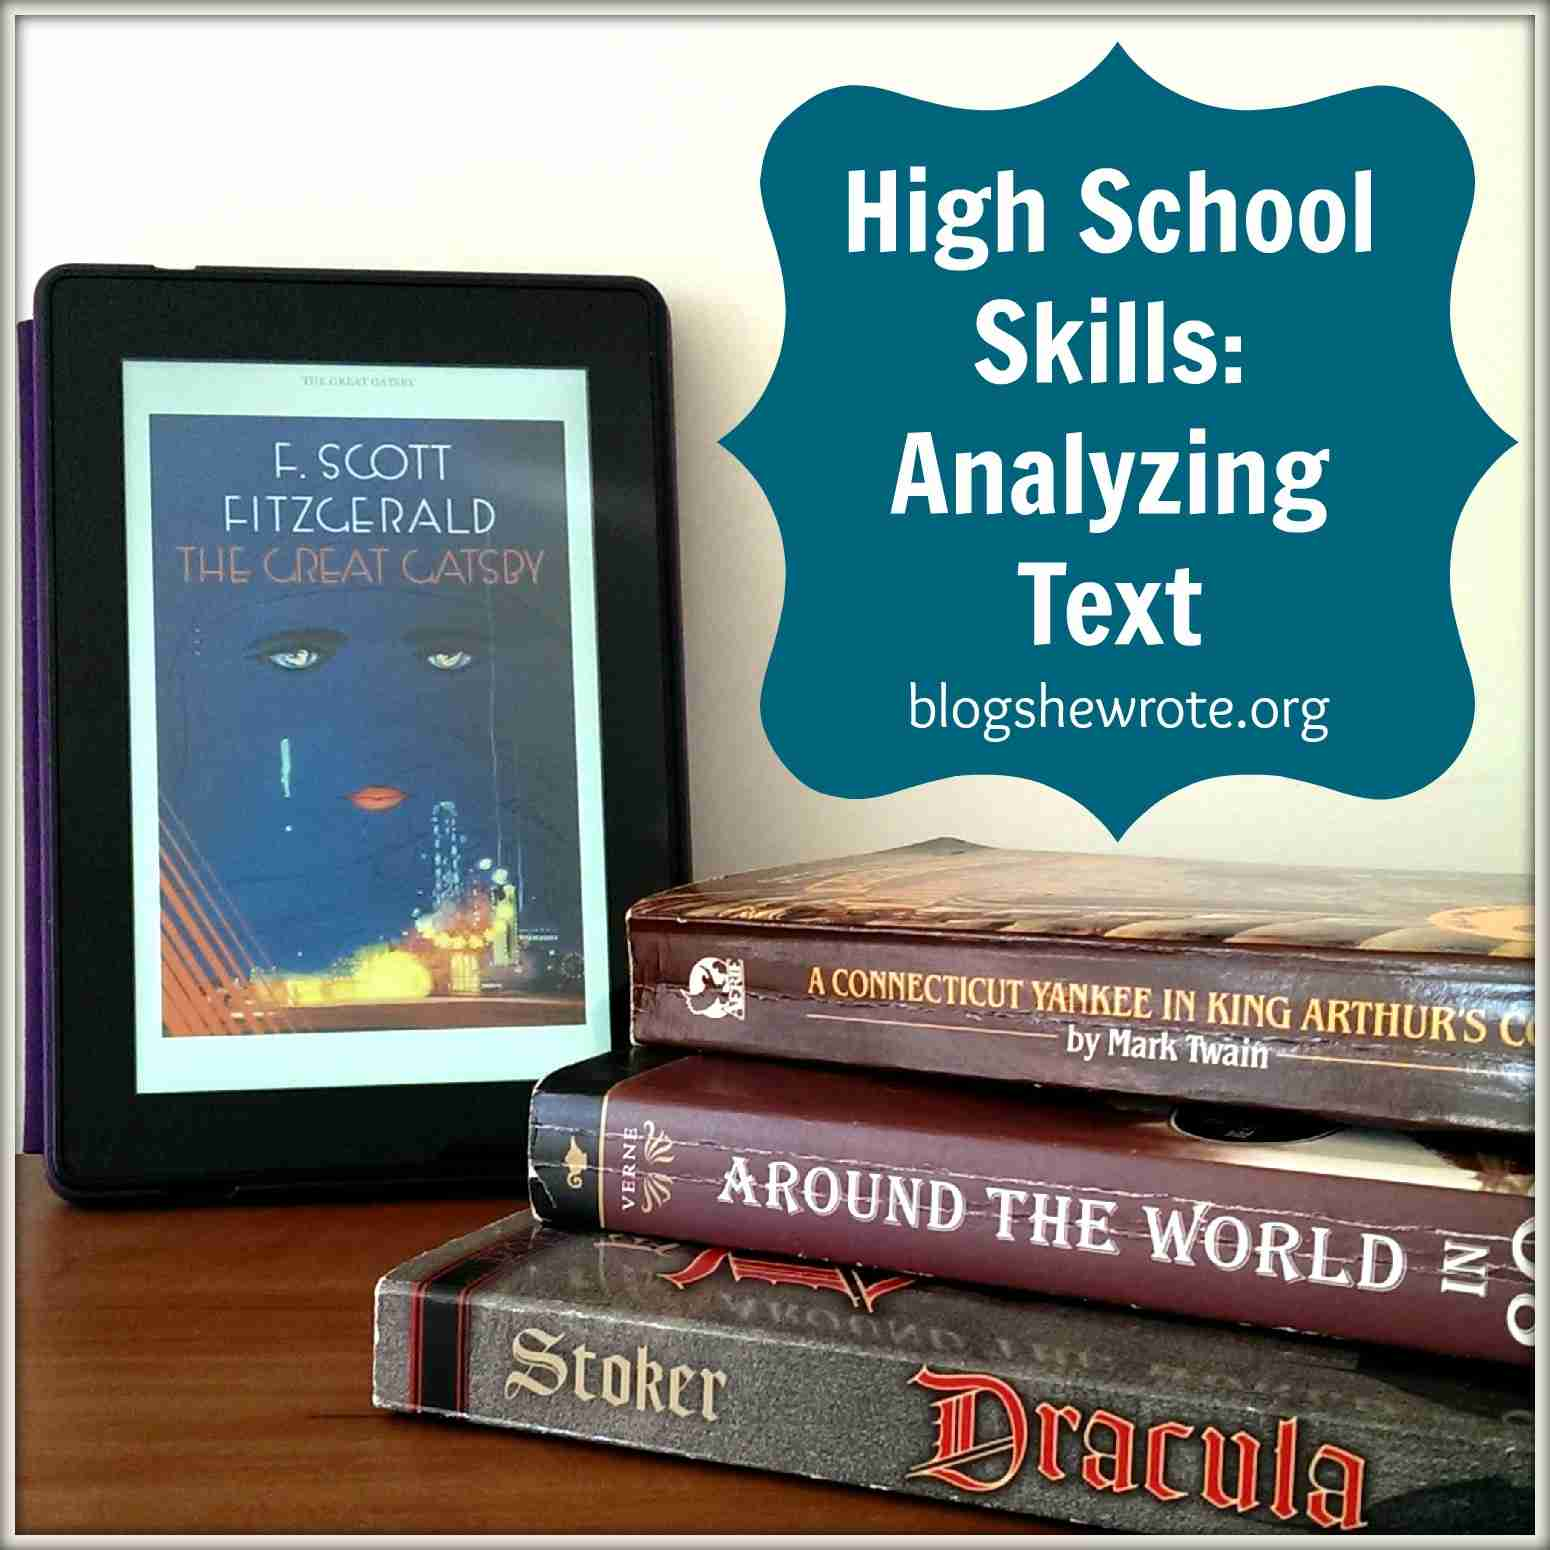 Blog, She Wrote: High School Skills- Analyzing Text